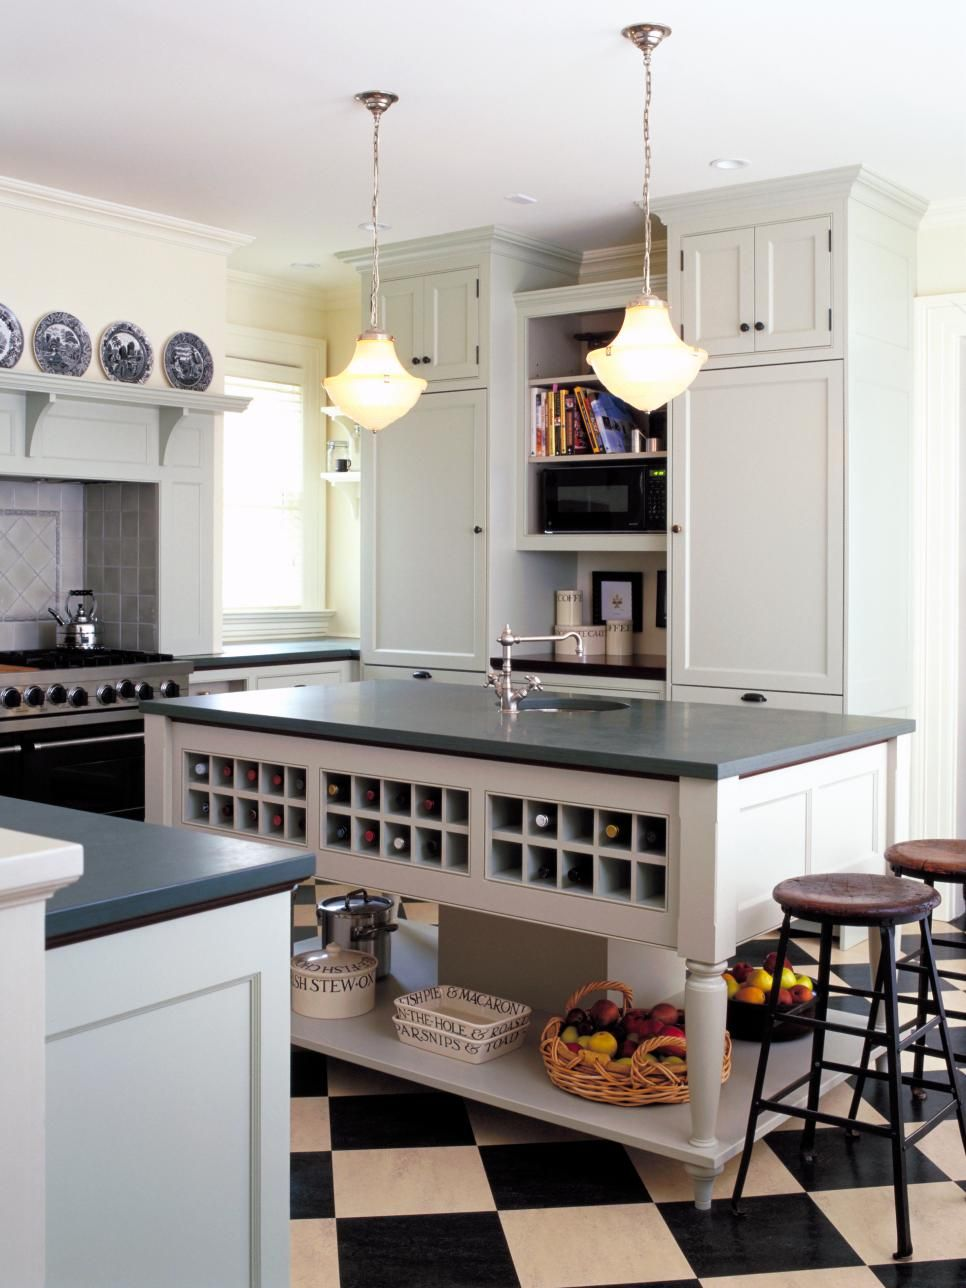 19 Kitchen Cabinet Storage Systems  Wine Storage Organizing And Prepossessing Designer Kitchen Cupboards Decorating Inspiration